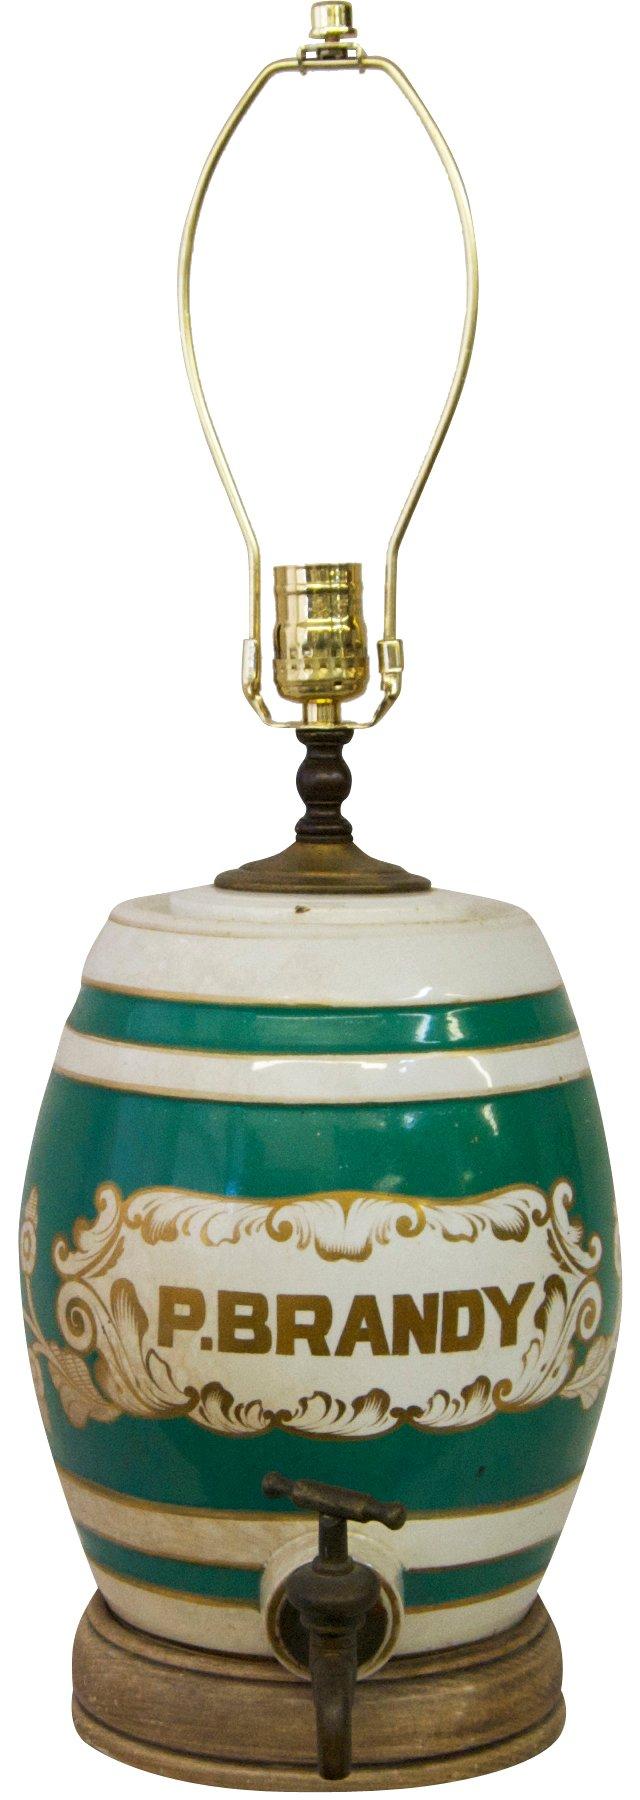 19th-C. English Brandy Jug Lamp